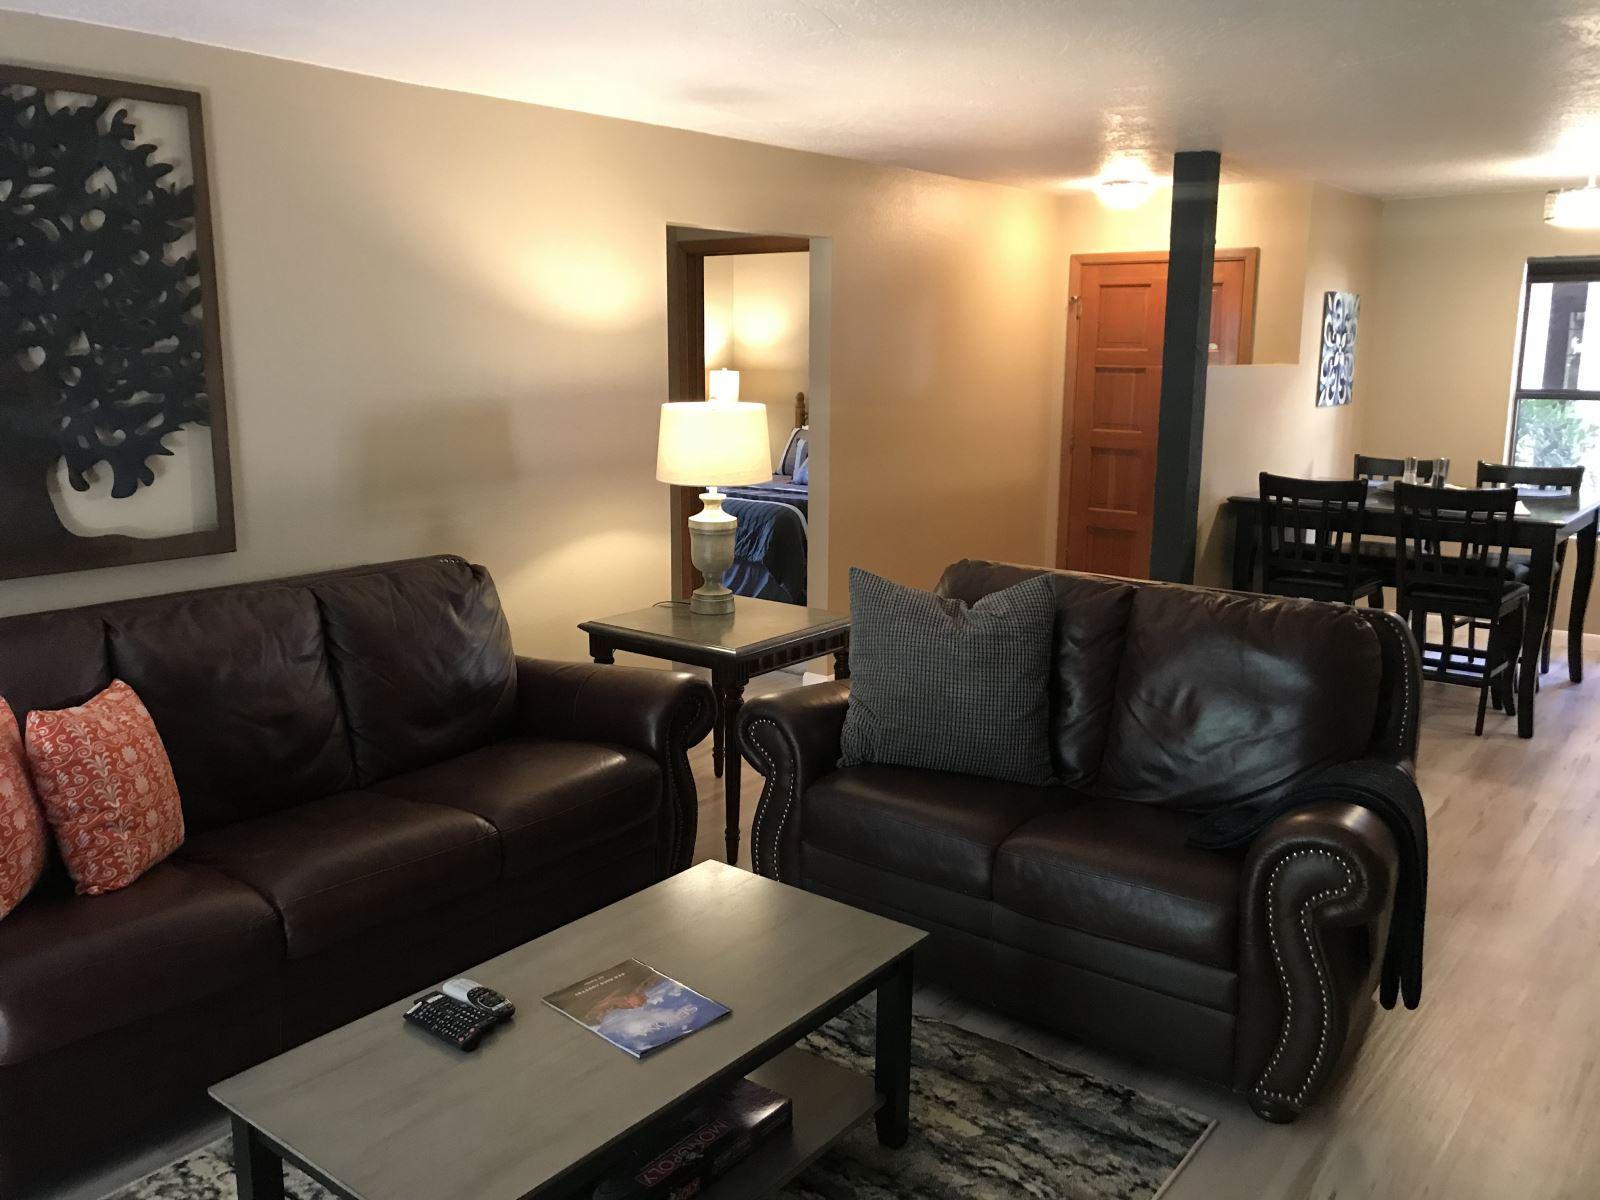 Living Room - Great Room